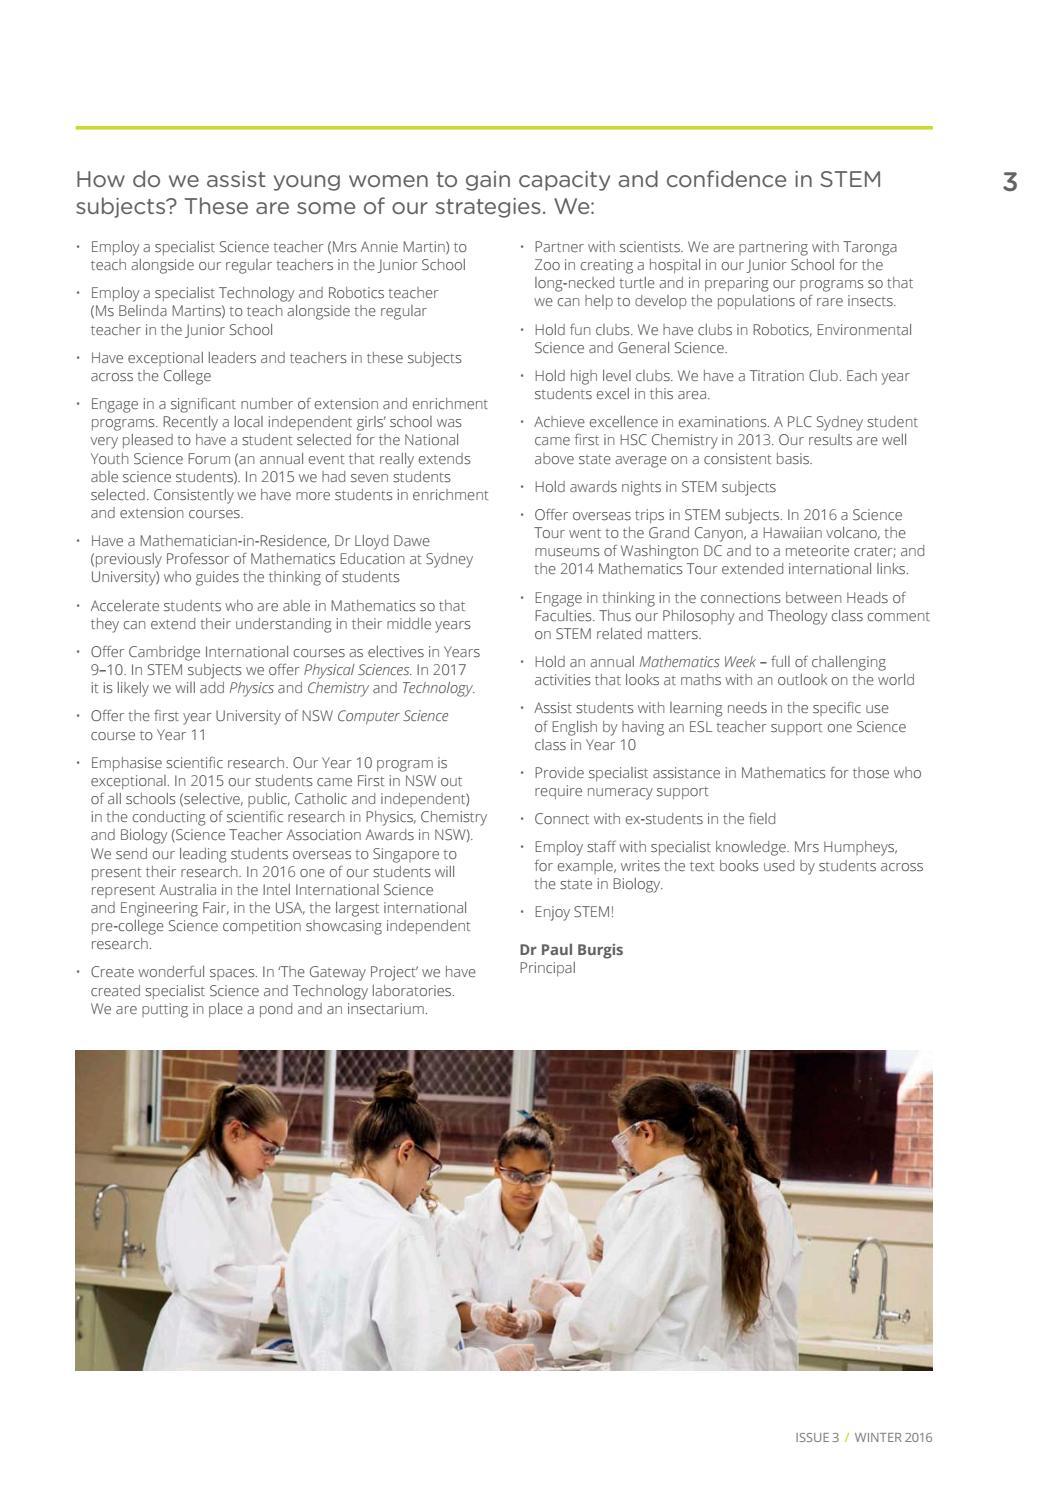 Camphora, Issue 3, Winter 2016 by PLC Sydney - issuu